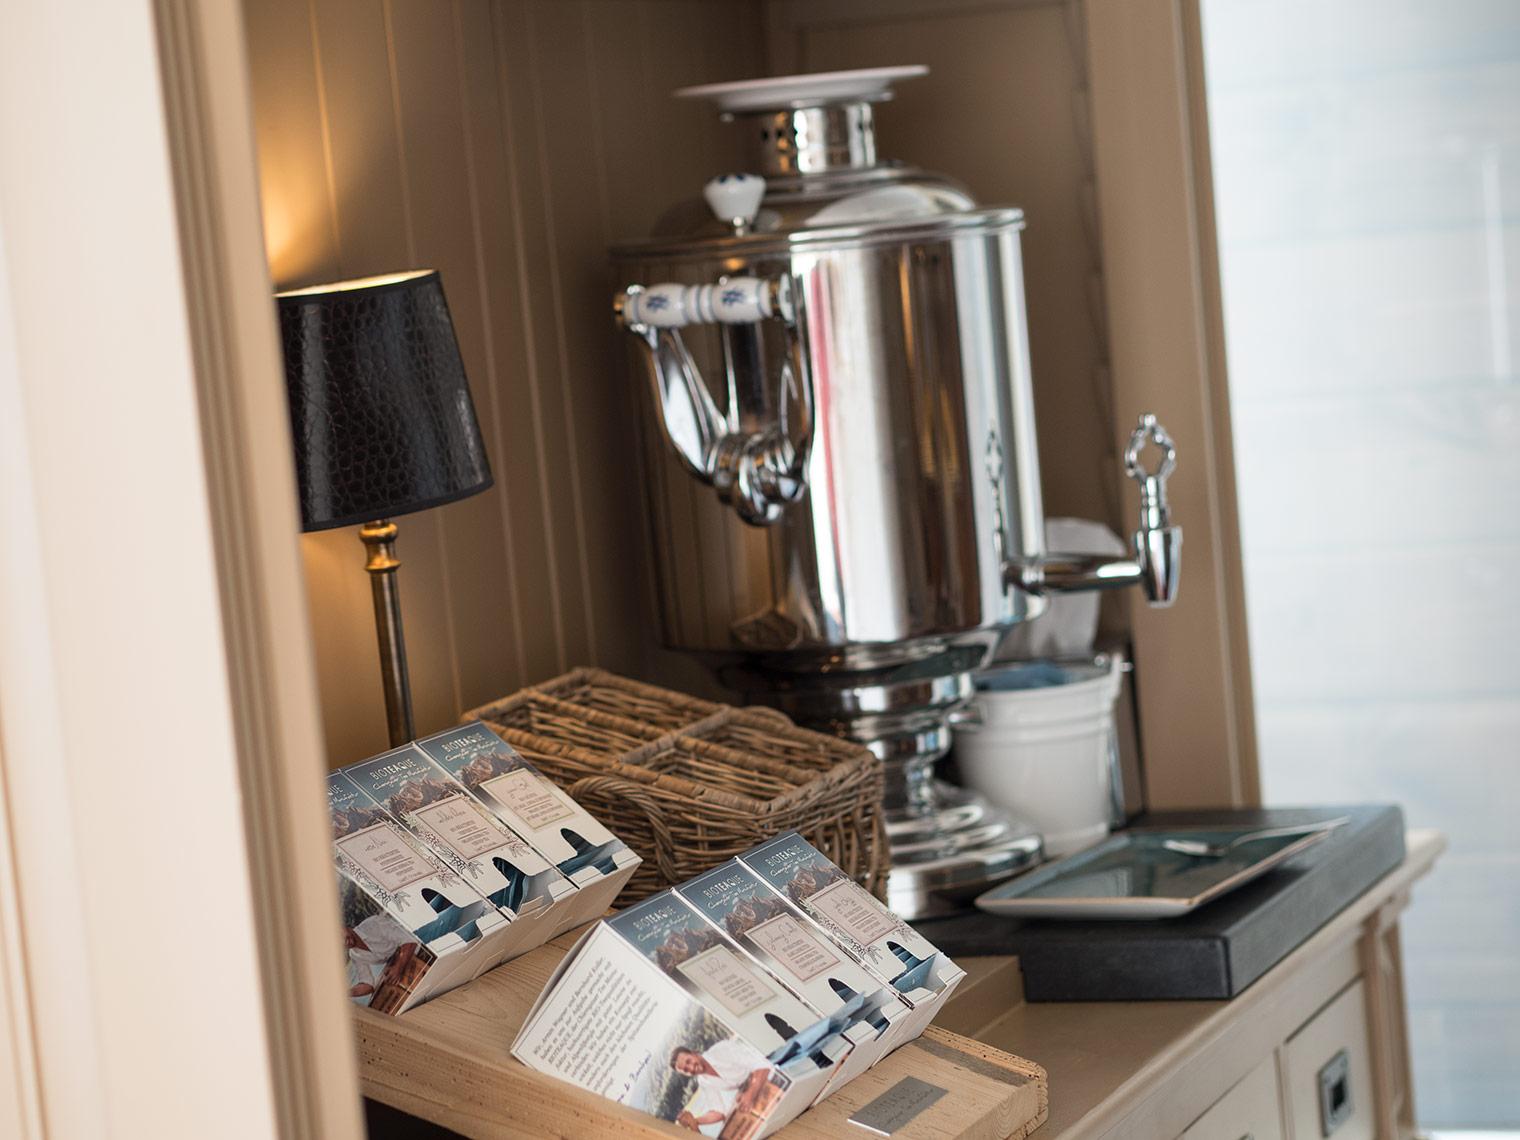 Tea selection at detox Mayr clinic in Austria